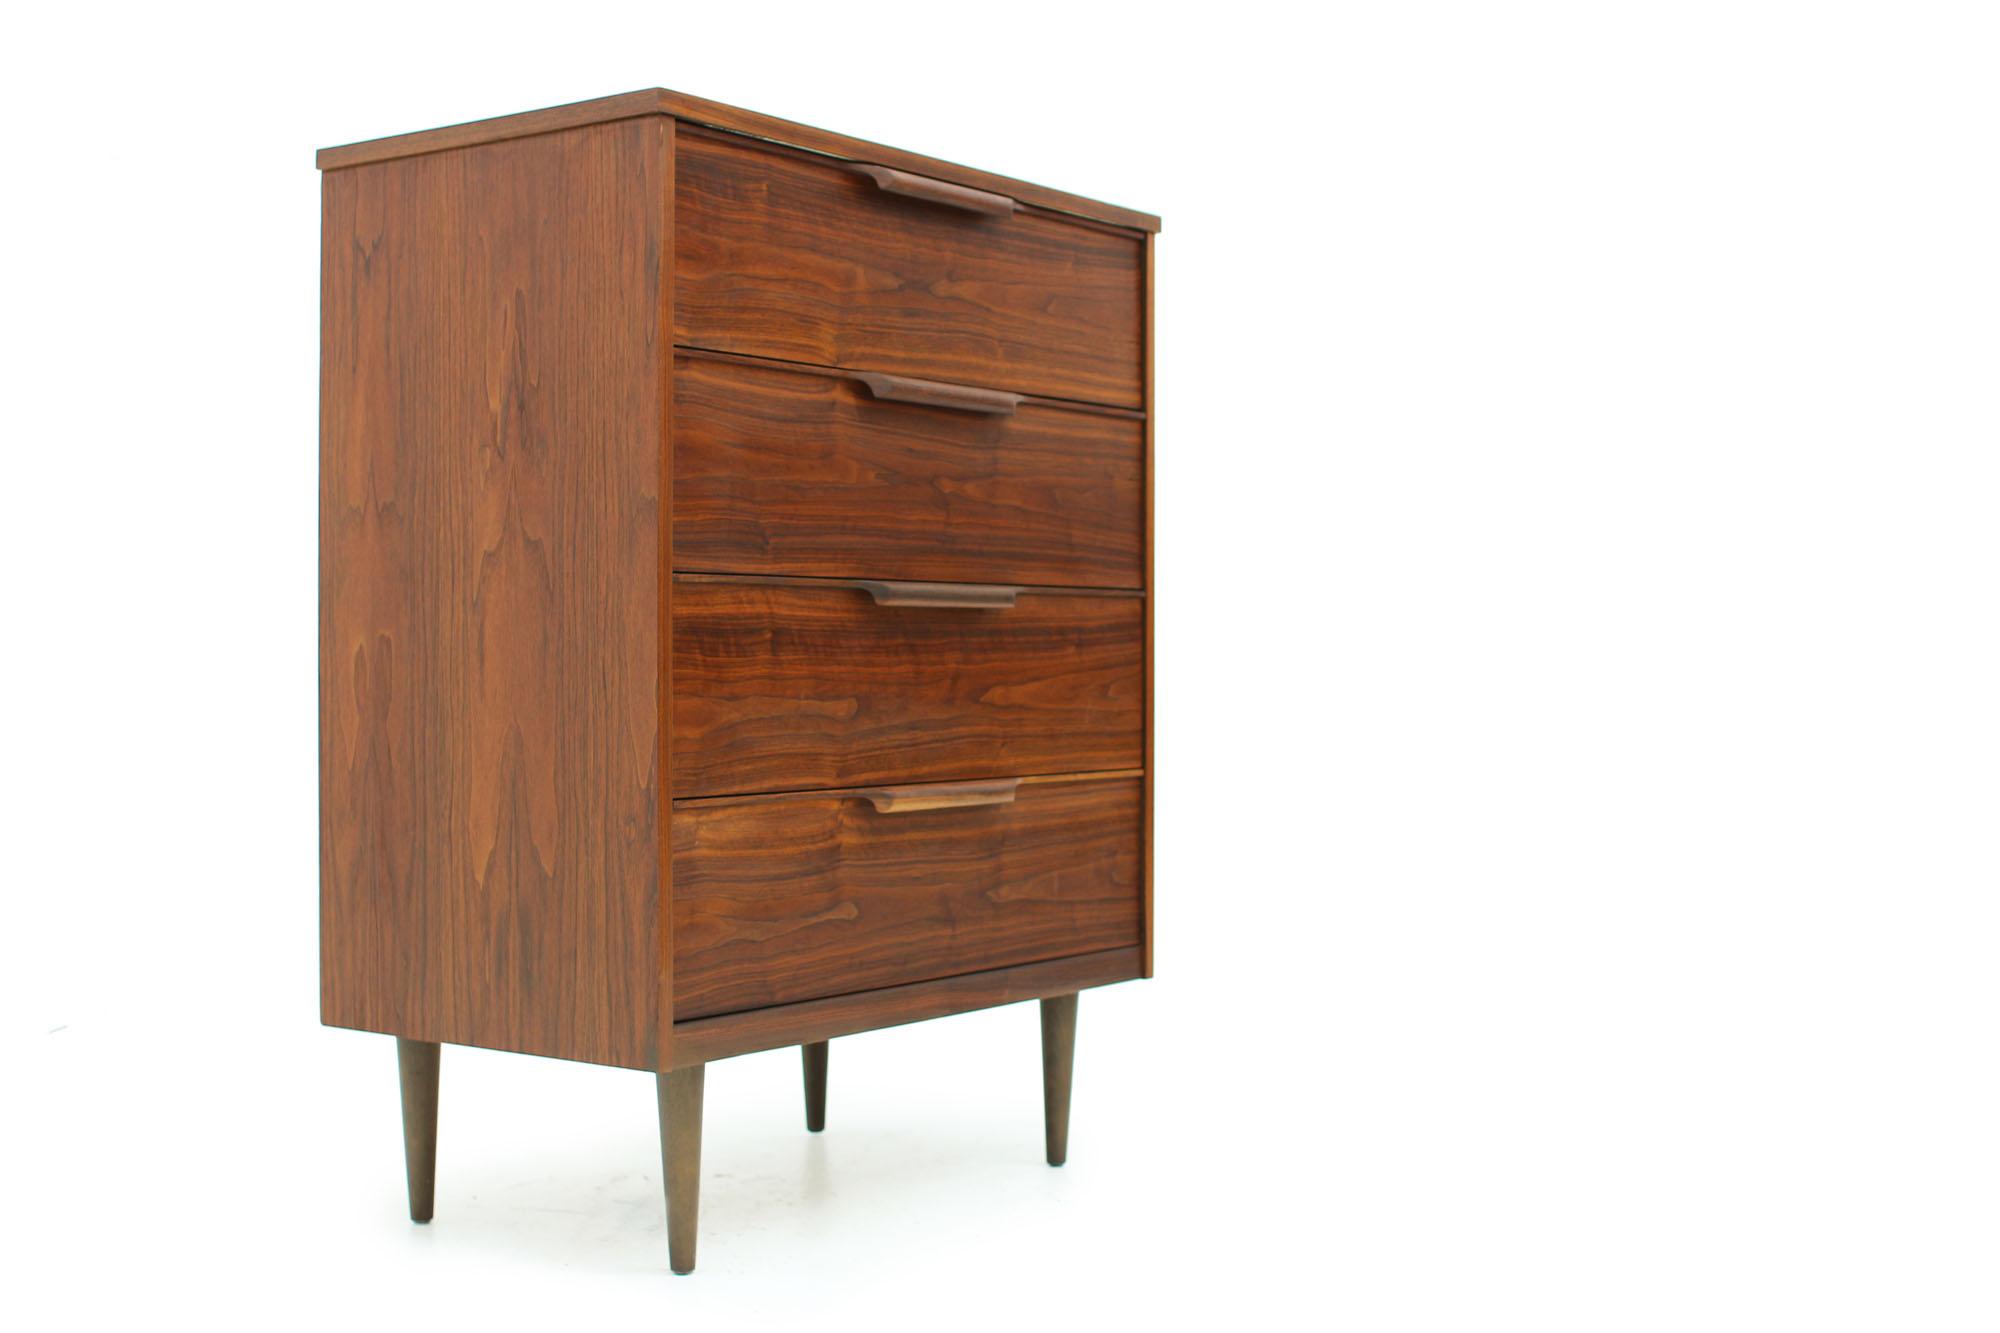 Retro 1960s Walnut Tall Dresser with Sculptural Handles (5).jpg